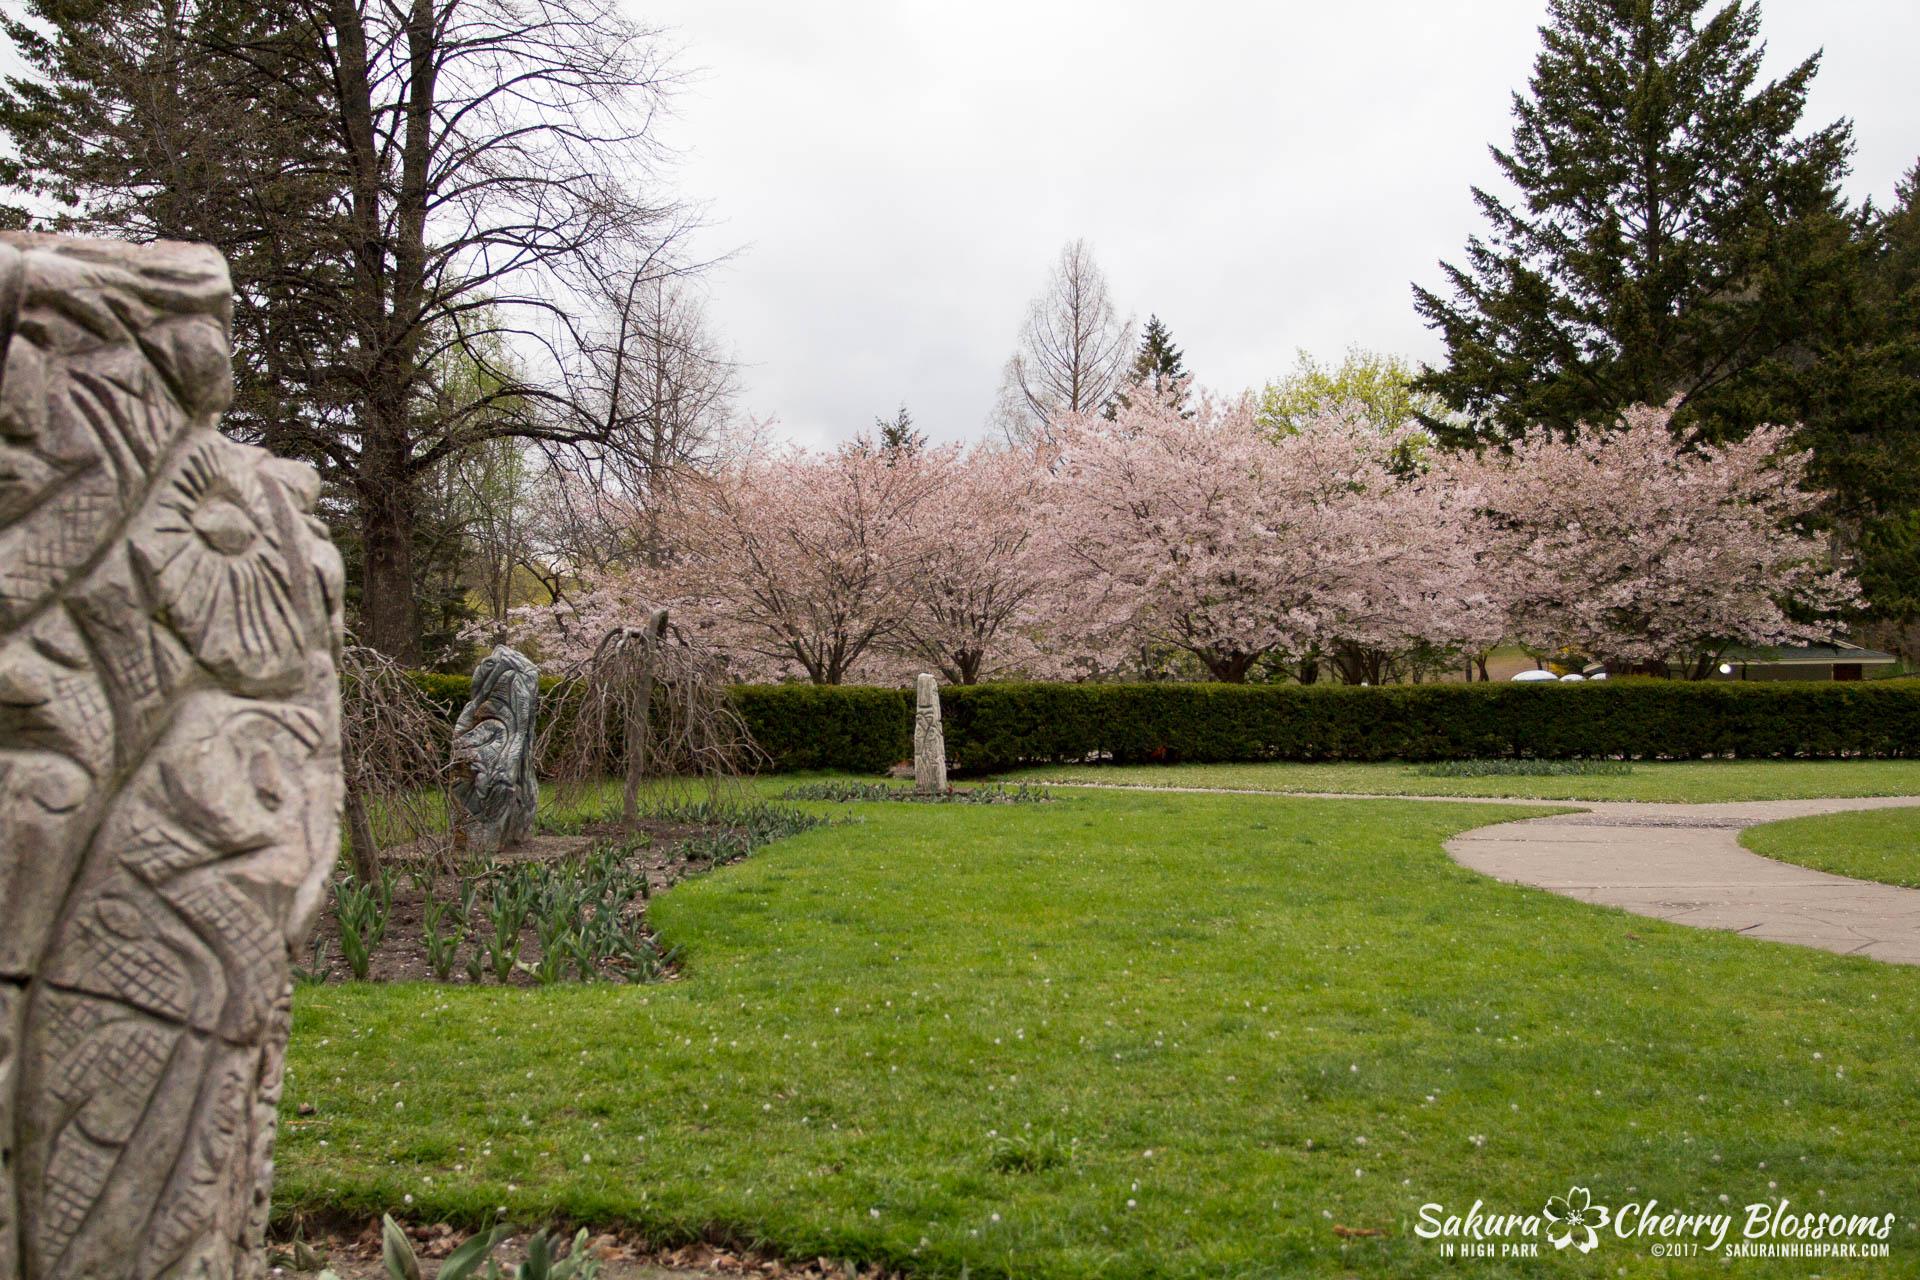 Sakura-Watch-May-2-2017-cherry-blossoms-falling-in-High-Park-211.jpg